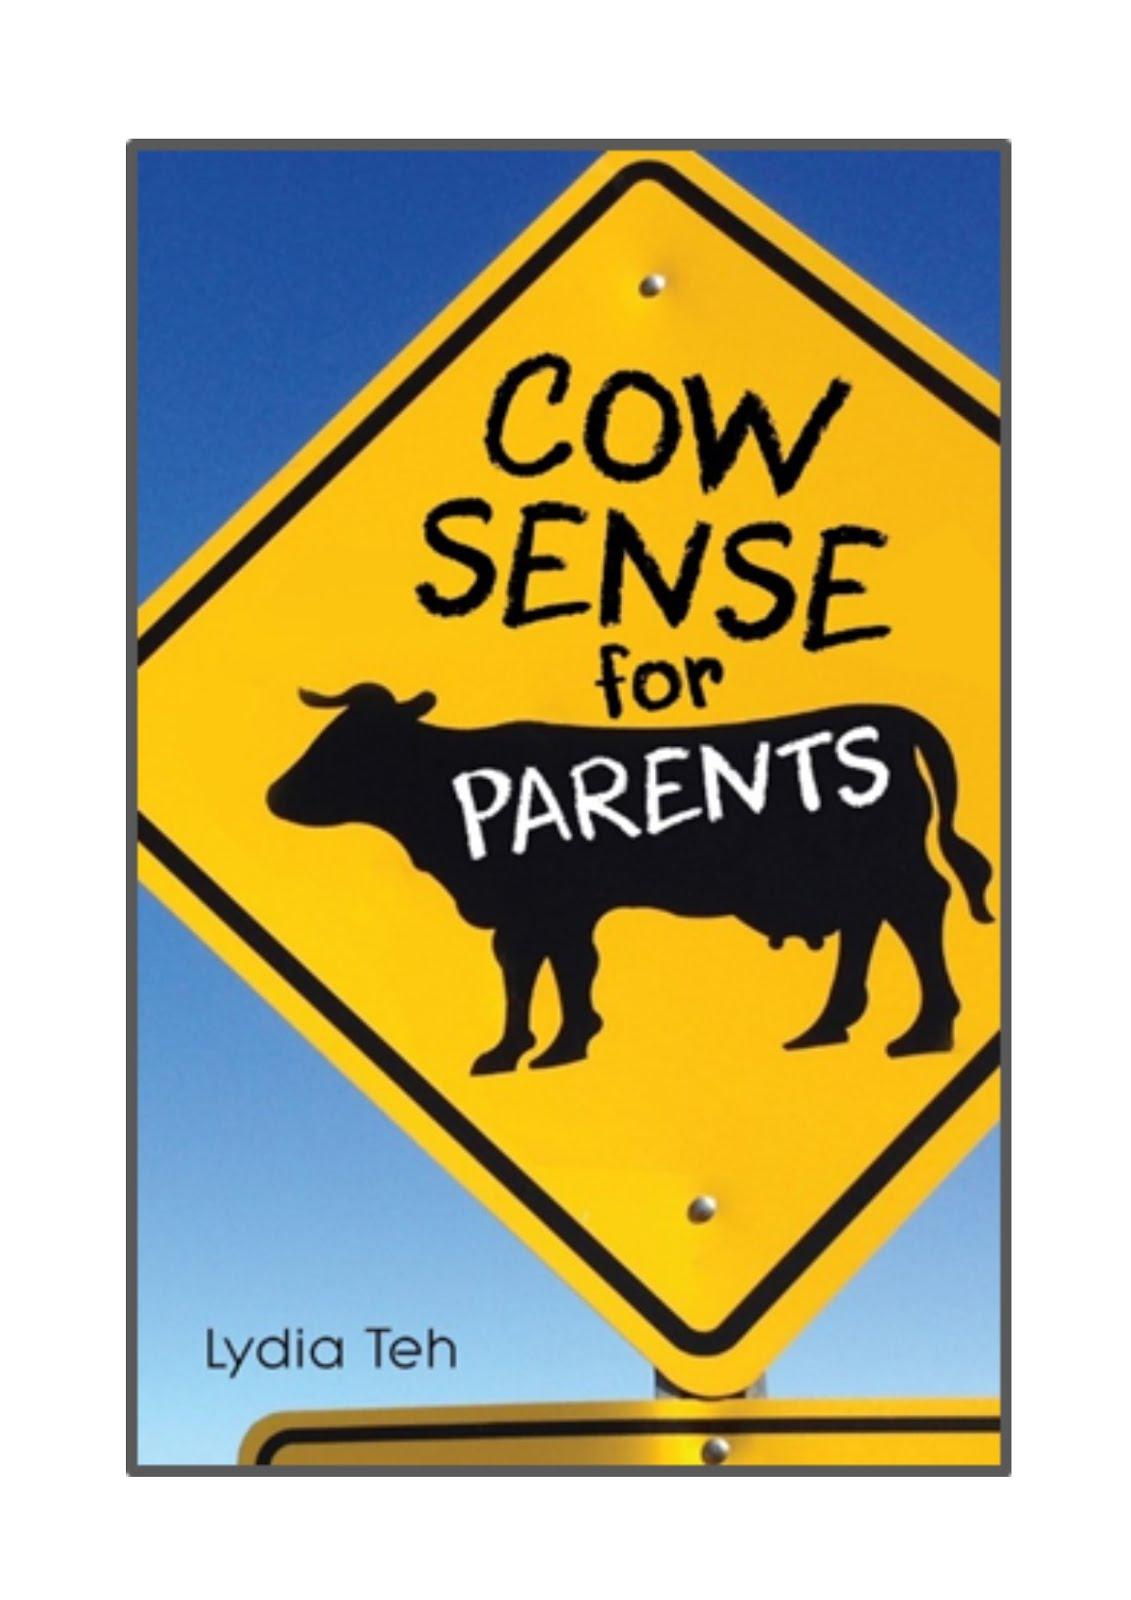 My eleventh book